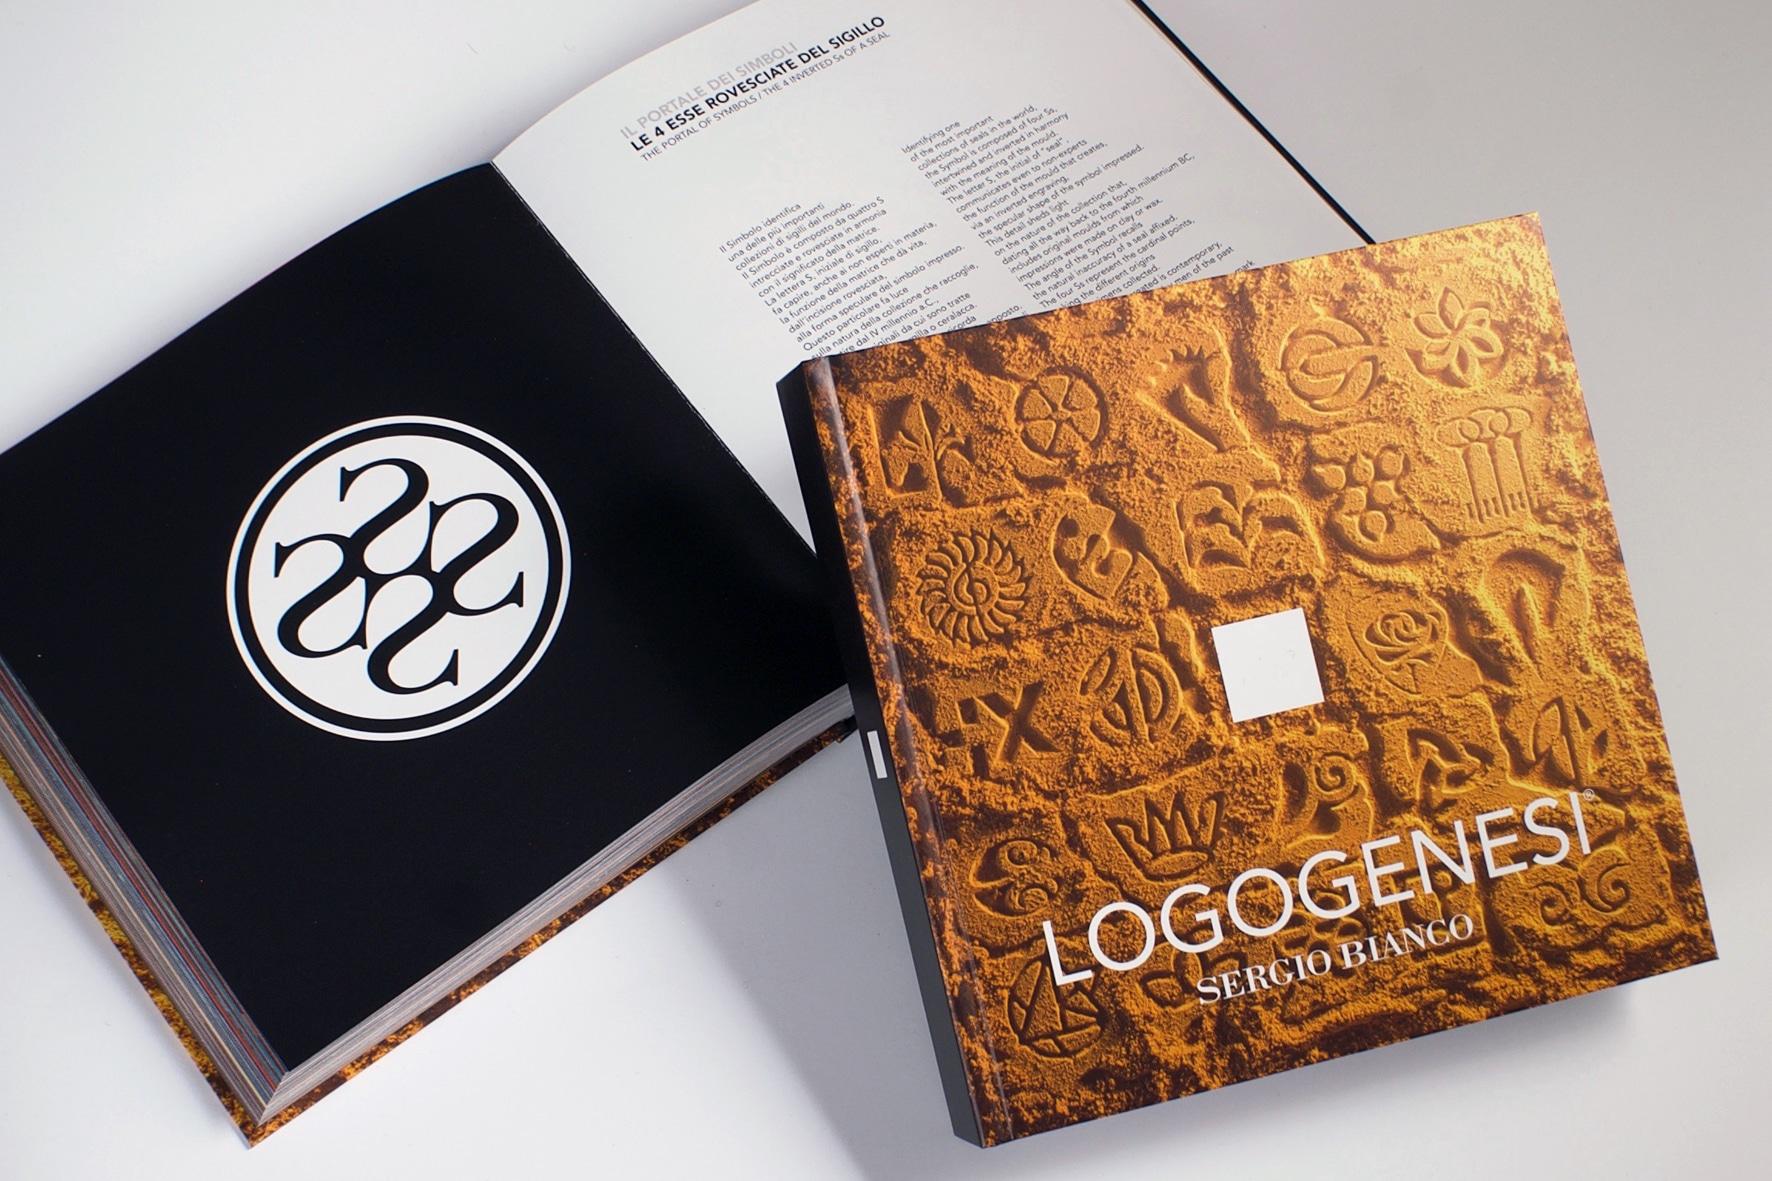 Museo del sigillo Logogenesi